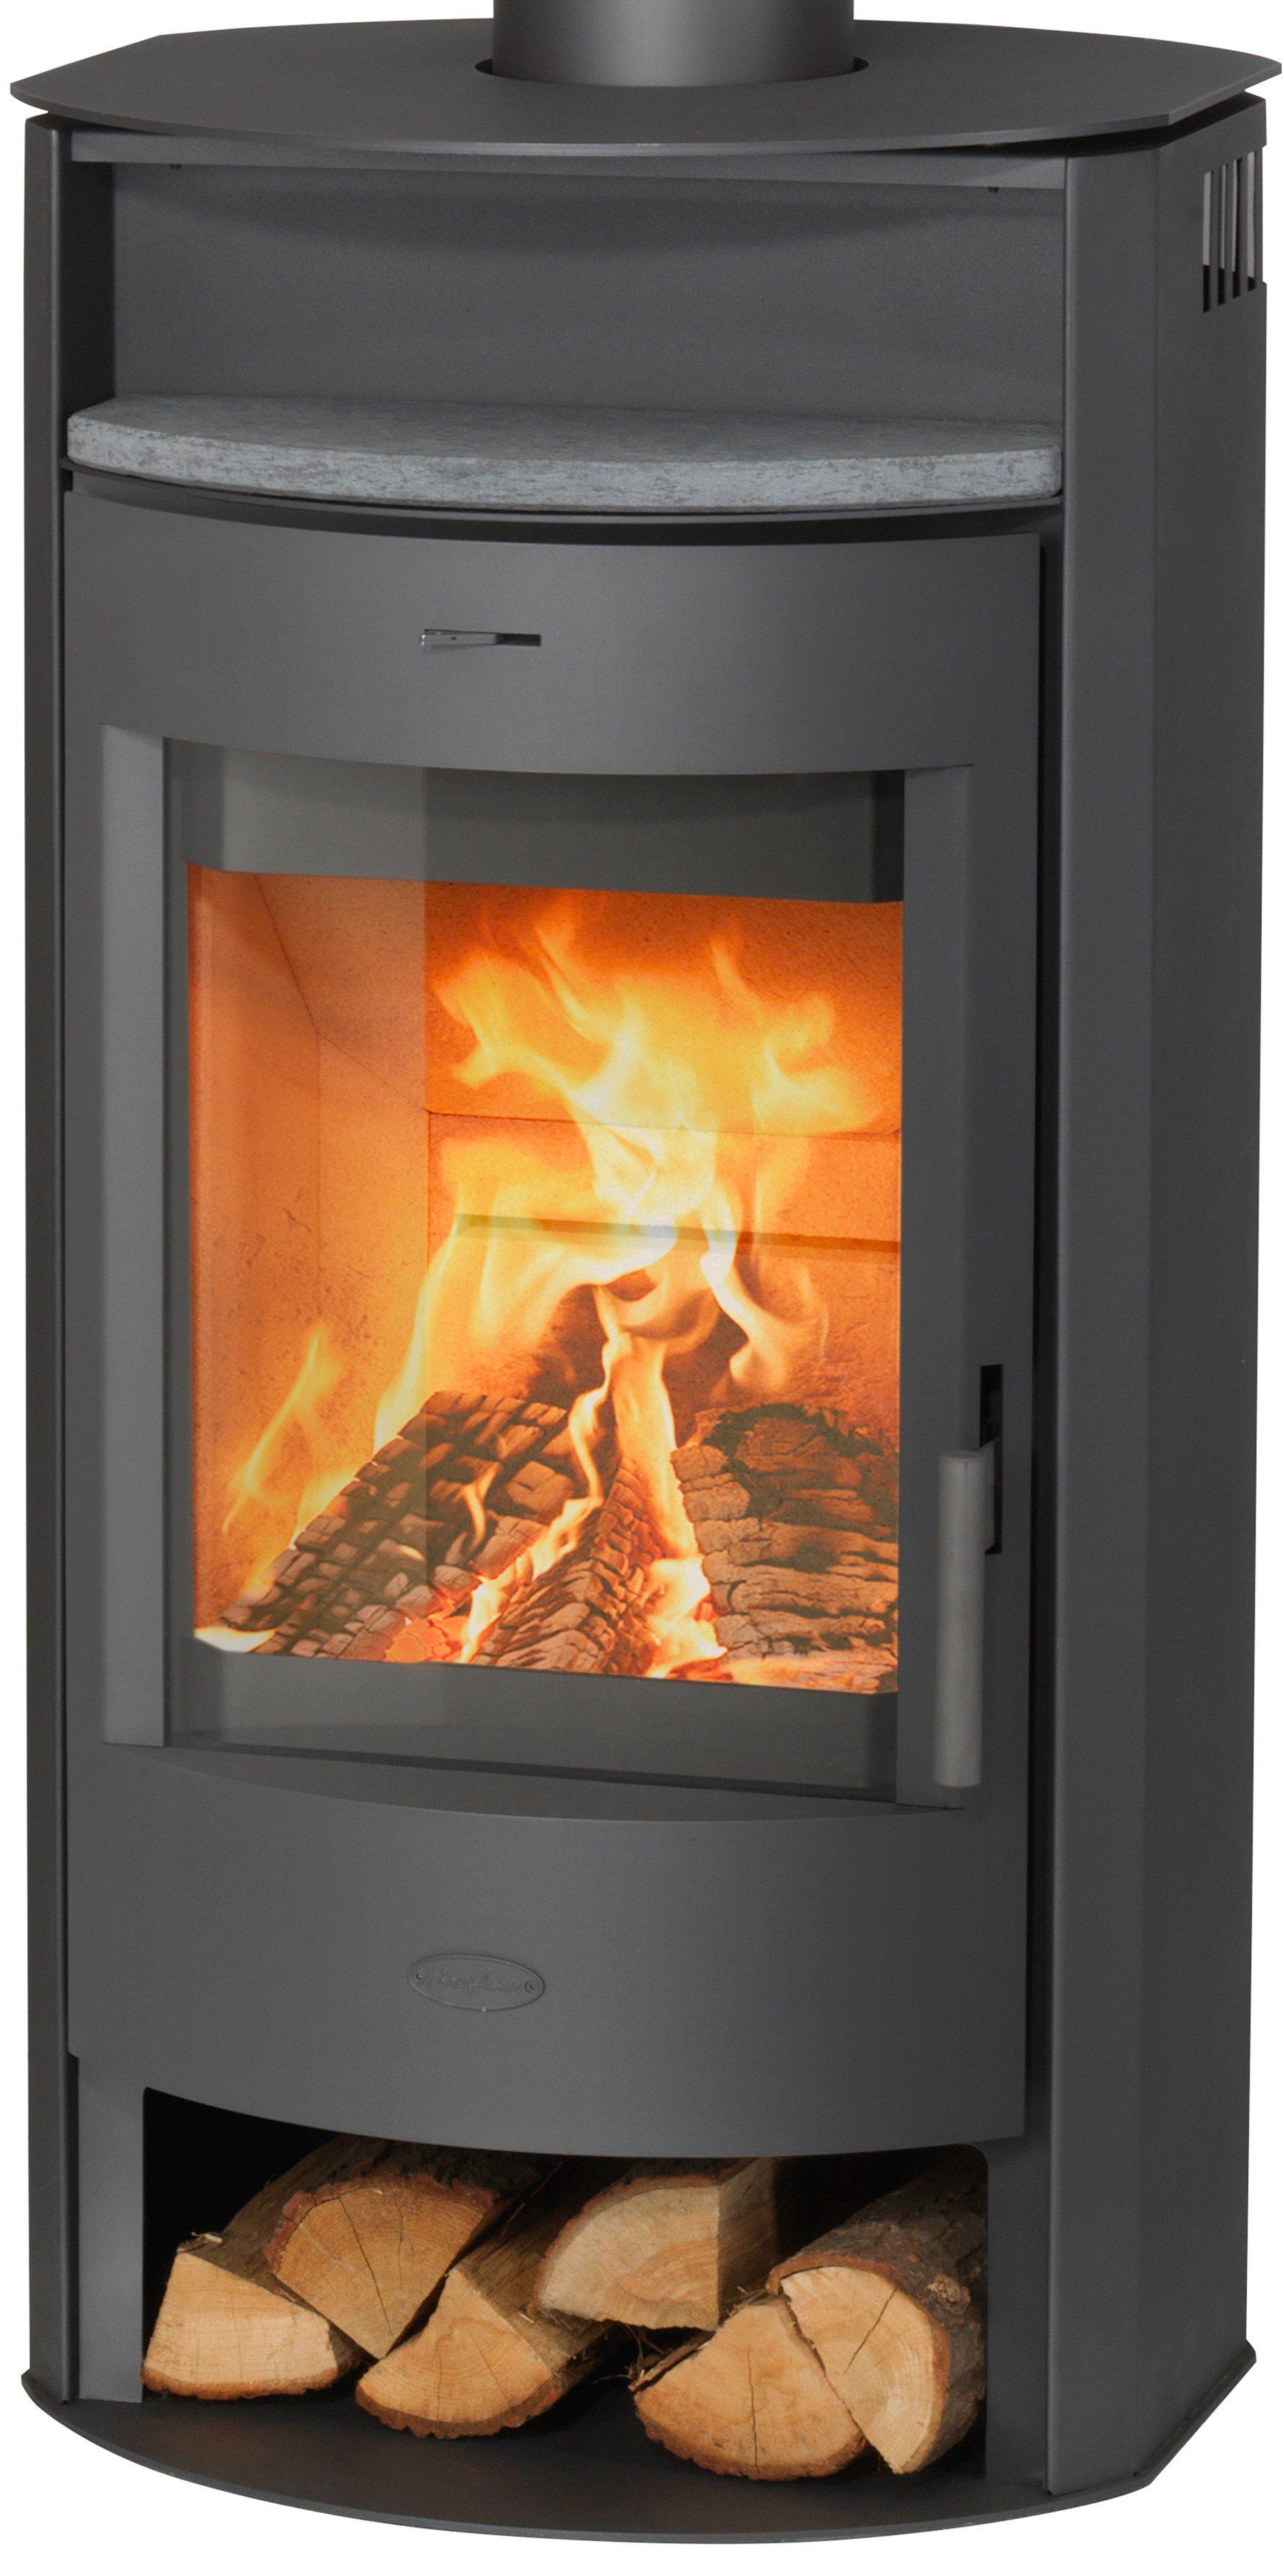 Fireplace Kaminofen »Prag«, Stahl, 6 kW, Panoramasichtscheibe, Konvexe Form